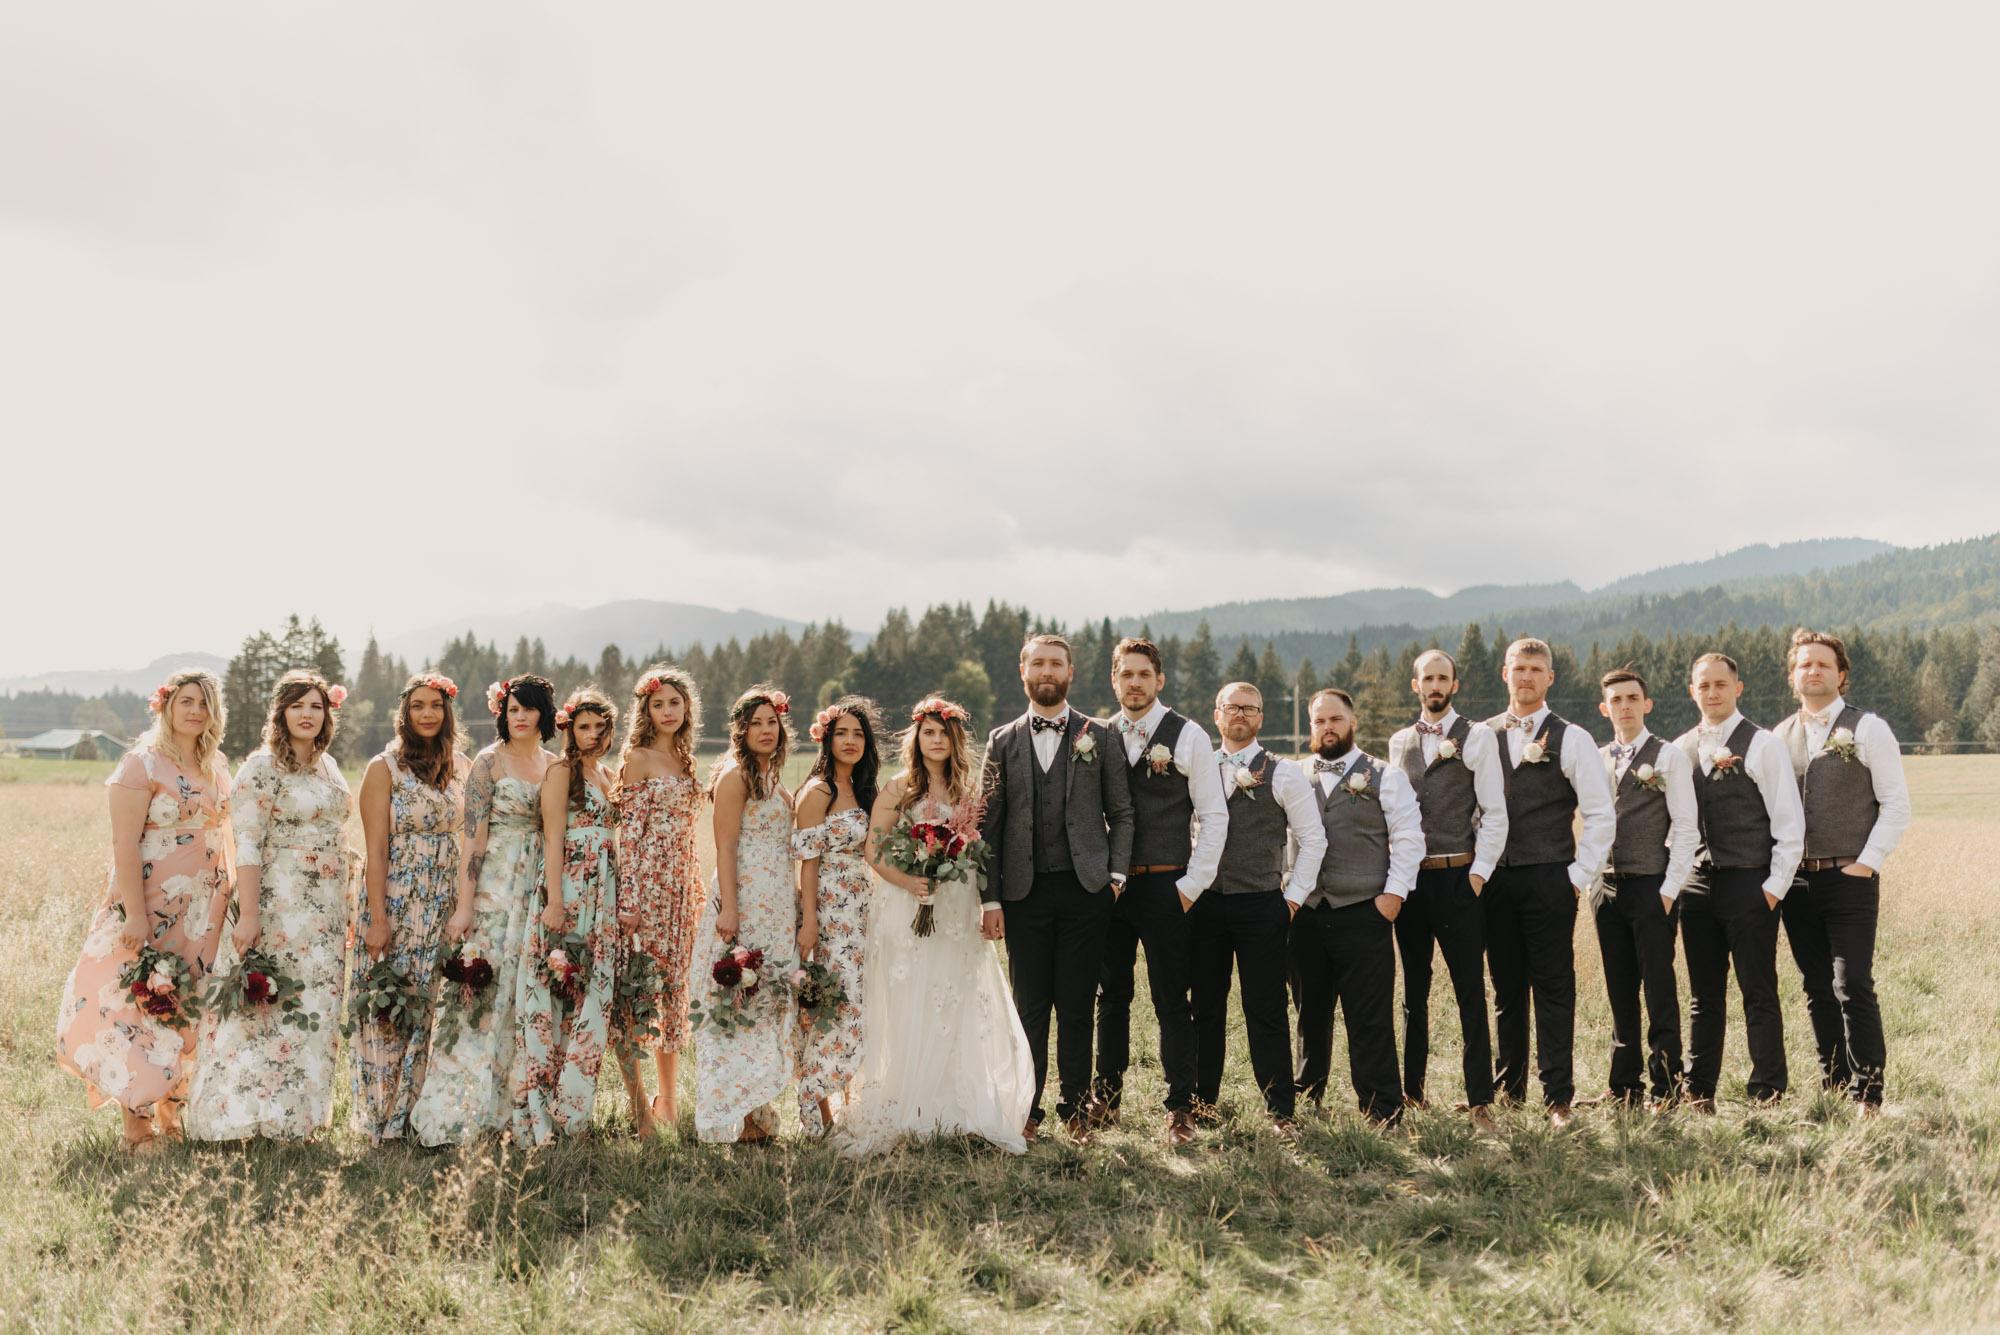 Bridal-Party-Free-People-Flower-Dresses-Washington-Wedding-8584.jpg